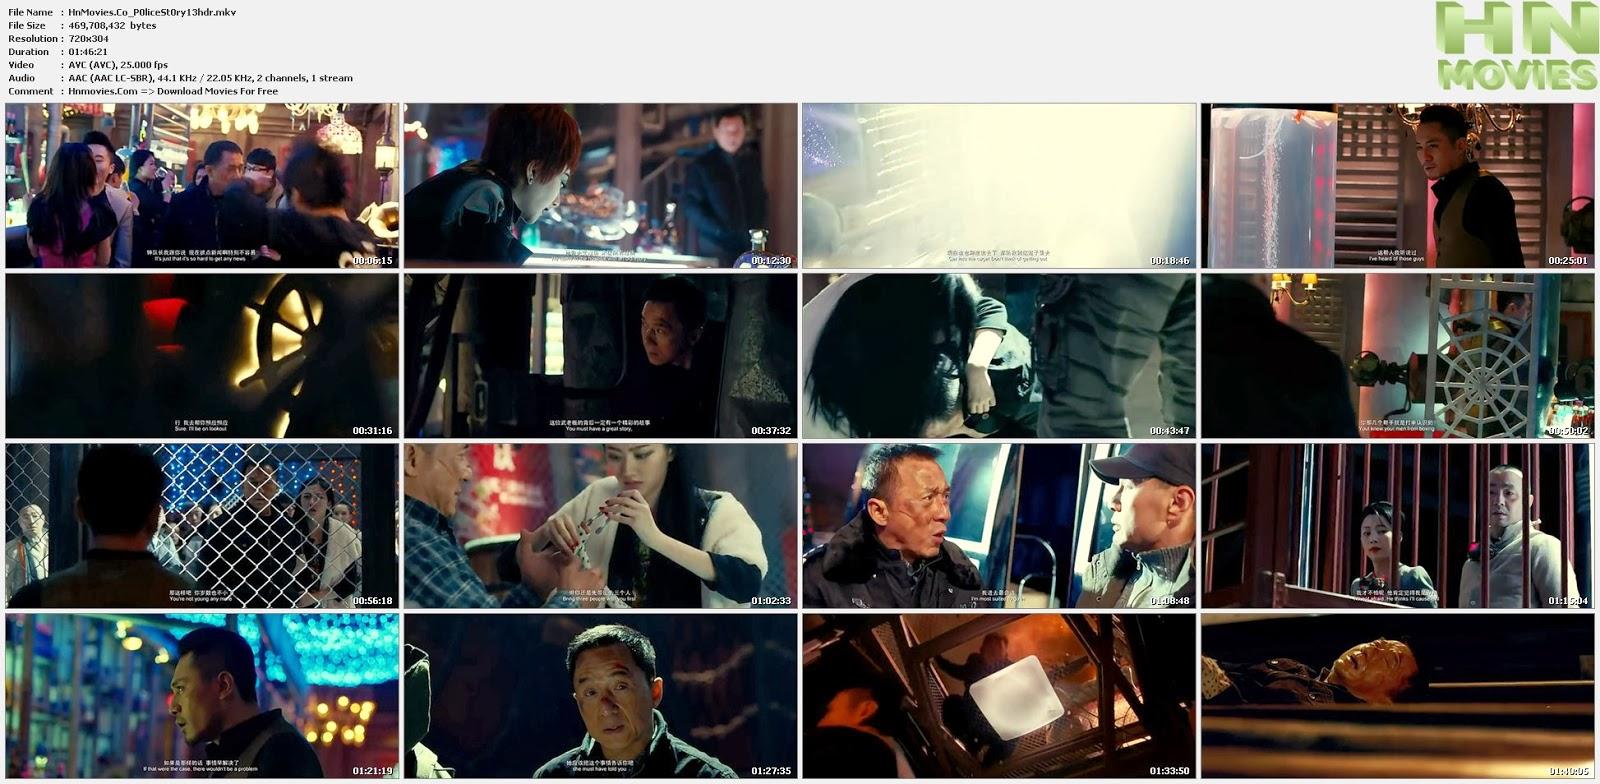 movie screenshot of Police Story fdmovie.com